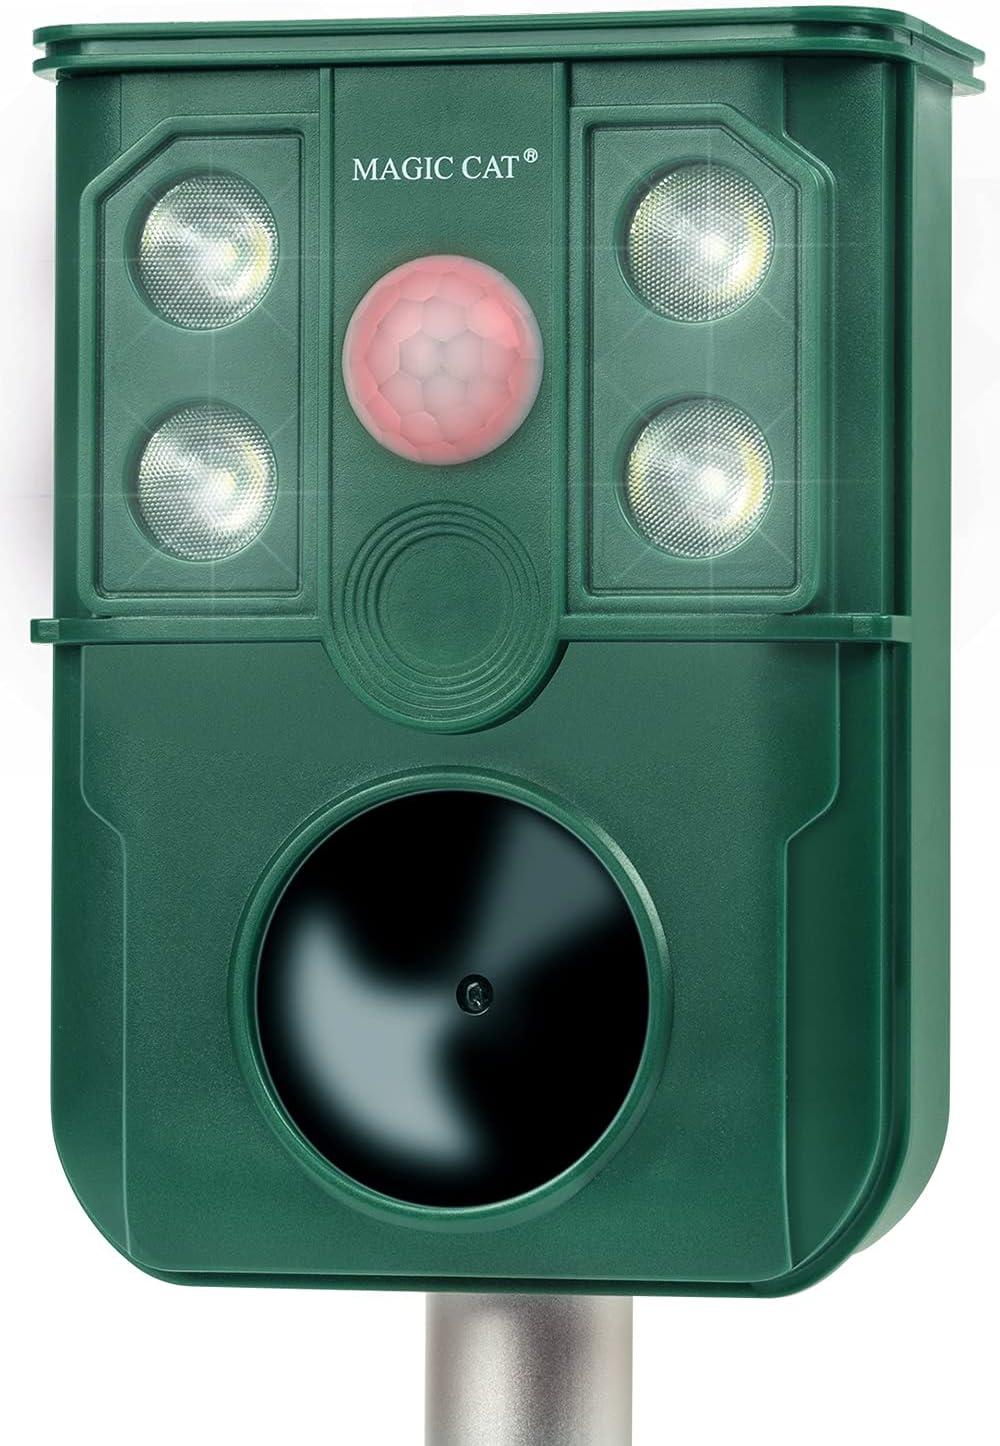 MAGIC CAT Solar Animal Repellent, Ultrasonic 5 in 1 Animal Repeller with Motion Sensor & Flashing Light, Waterproof Garden Yard Farm Repellent for Cat, Dog, Rat, Raccoon, Skunk, Squirrel, Deer, Rabbit